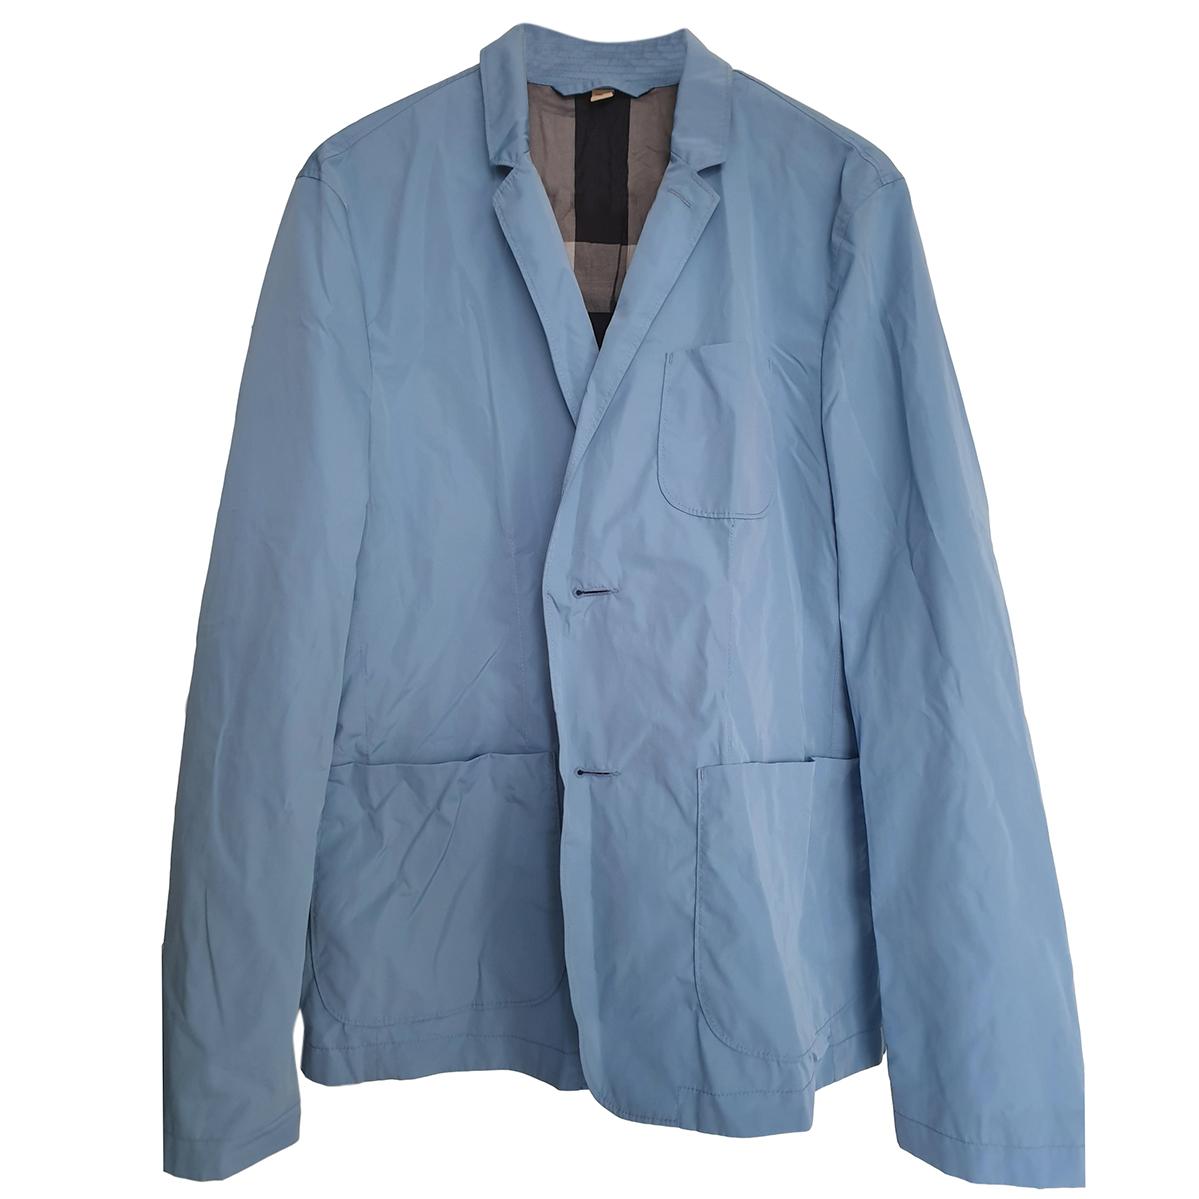 Burberry Brit blue rain jacket in a bag